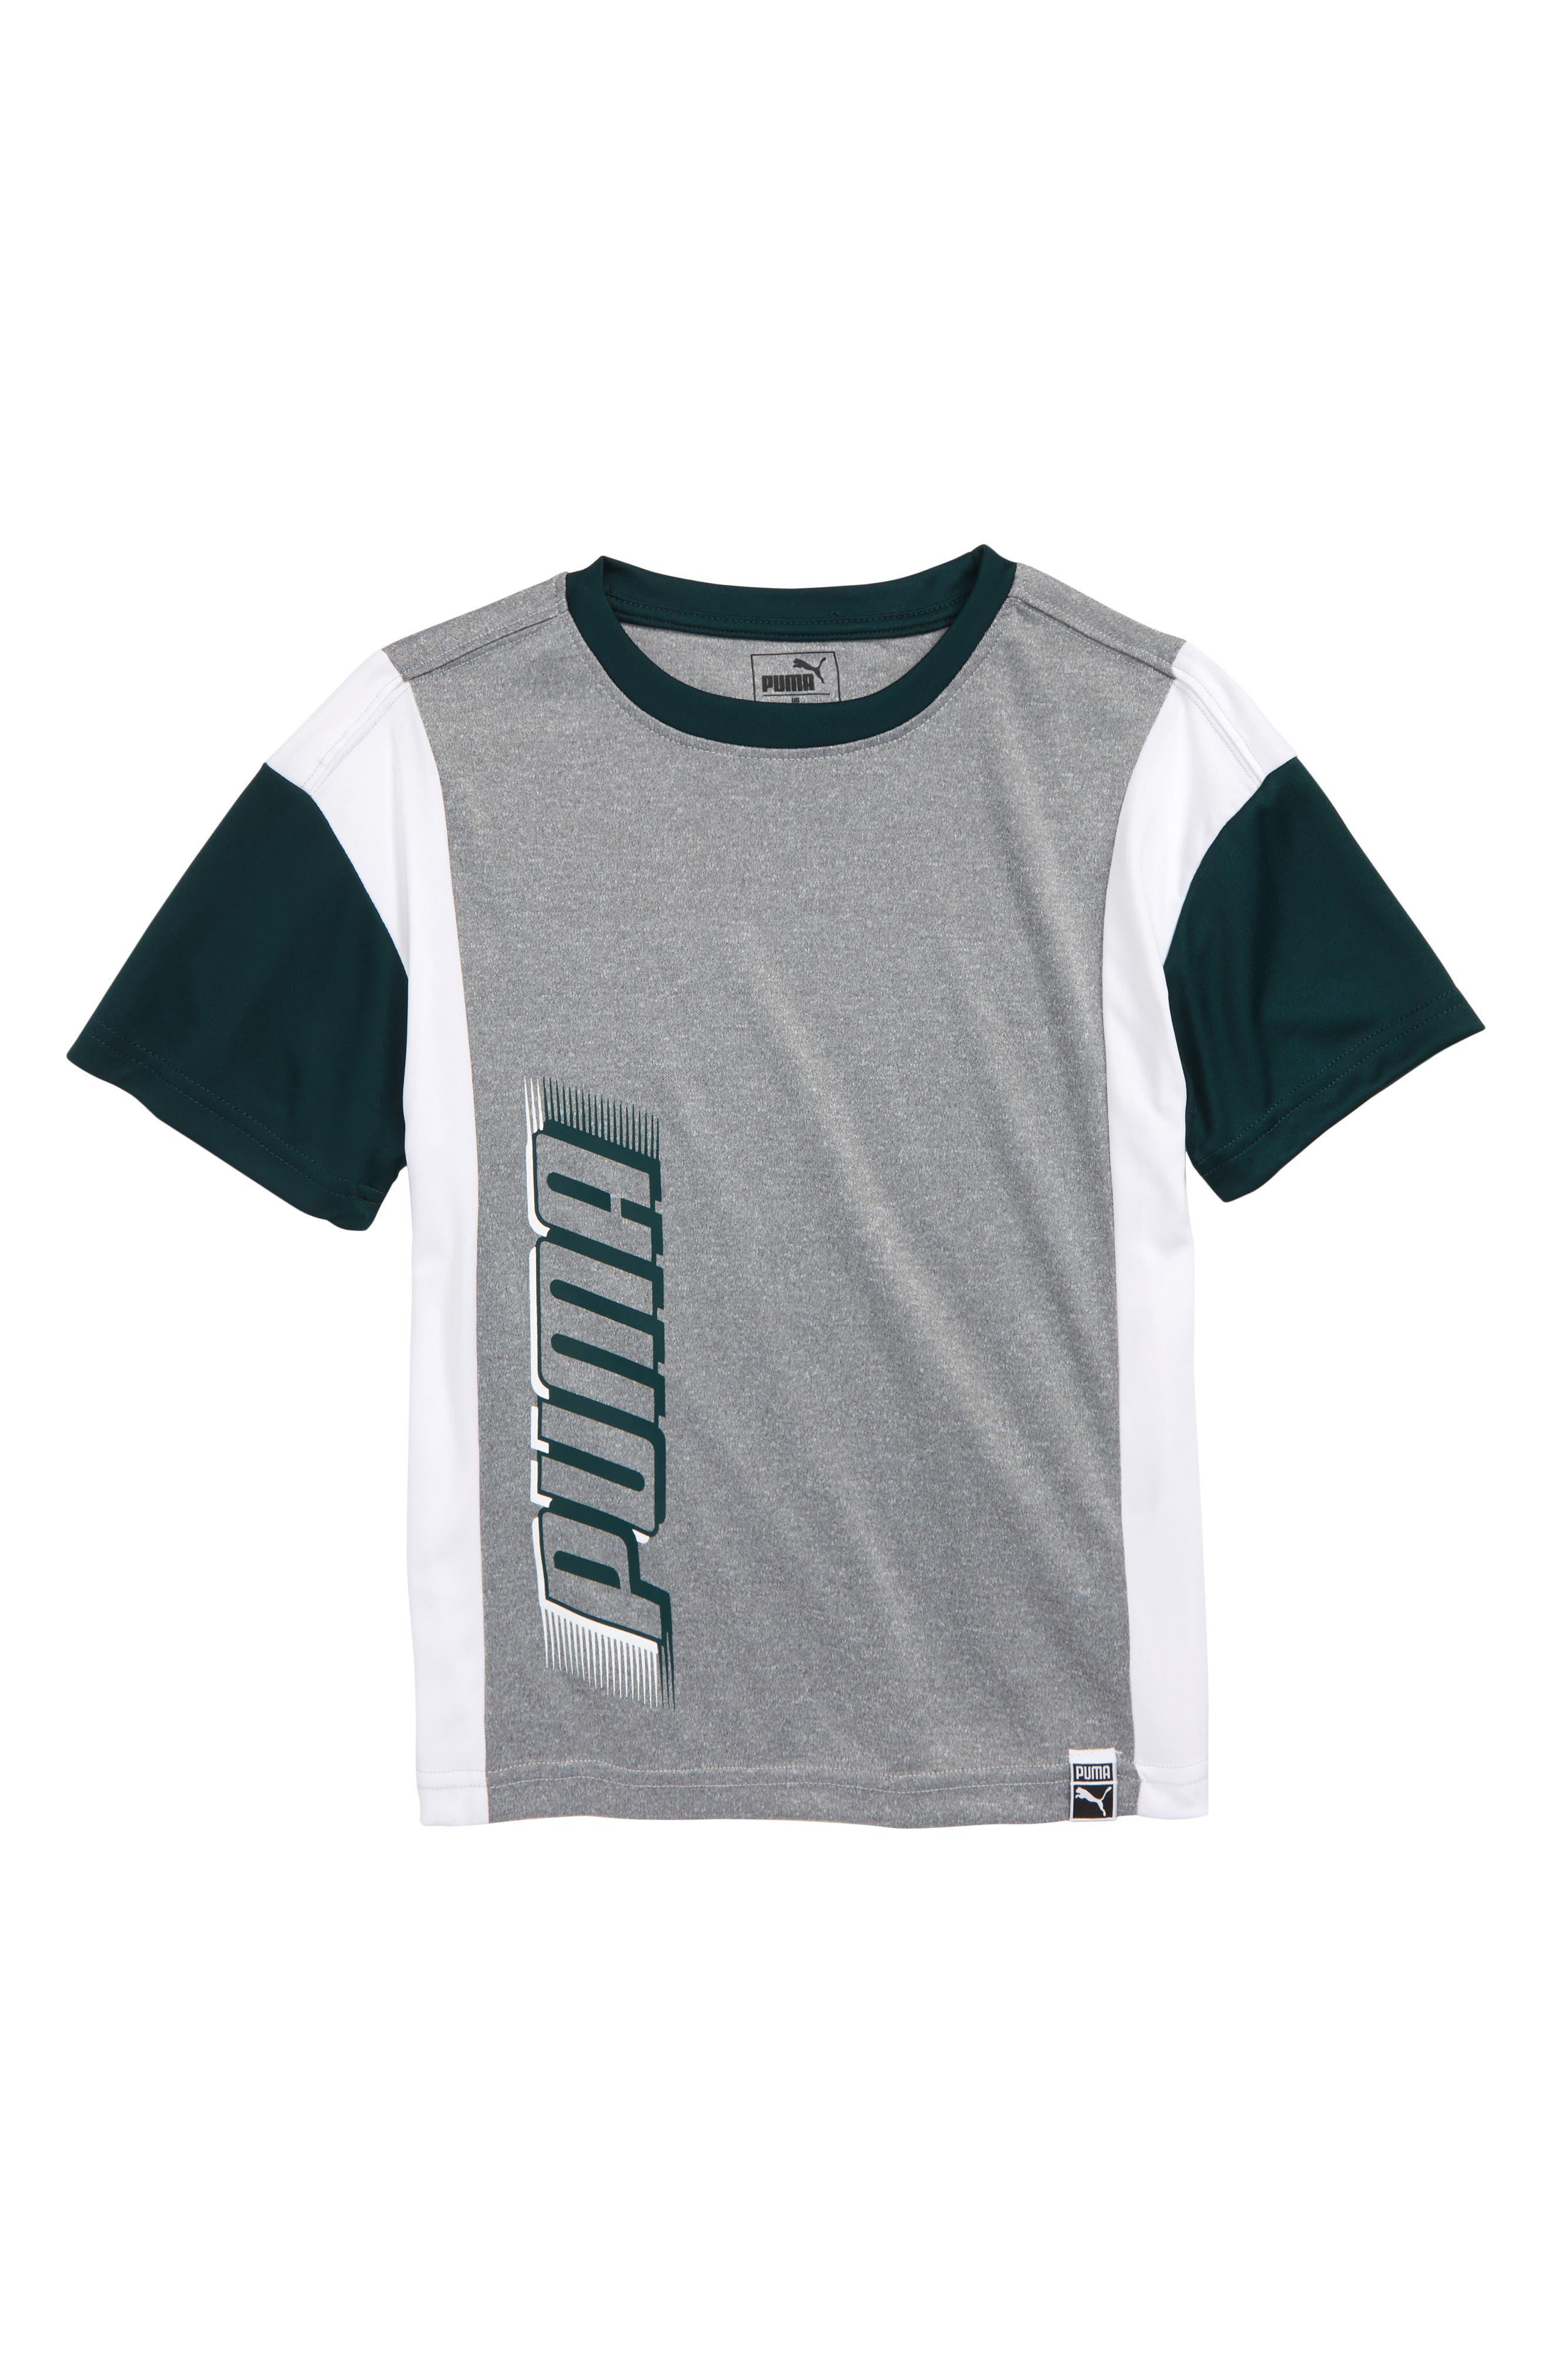 PUMA Oversize T-Shirt, Main, color, 020